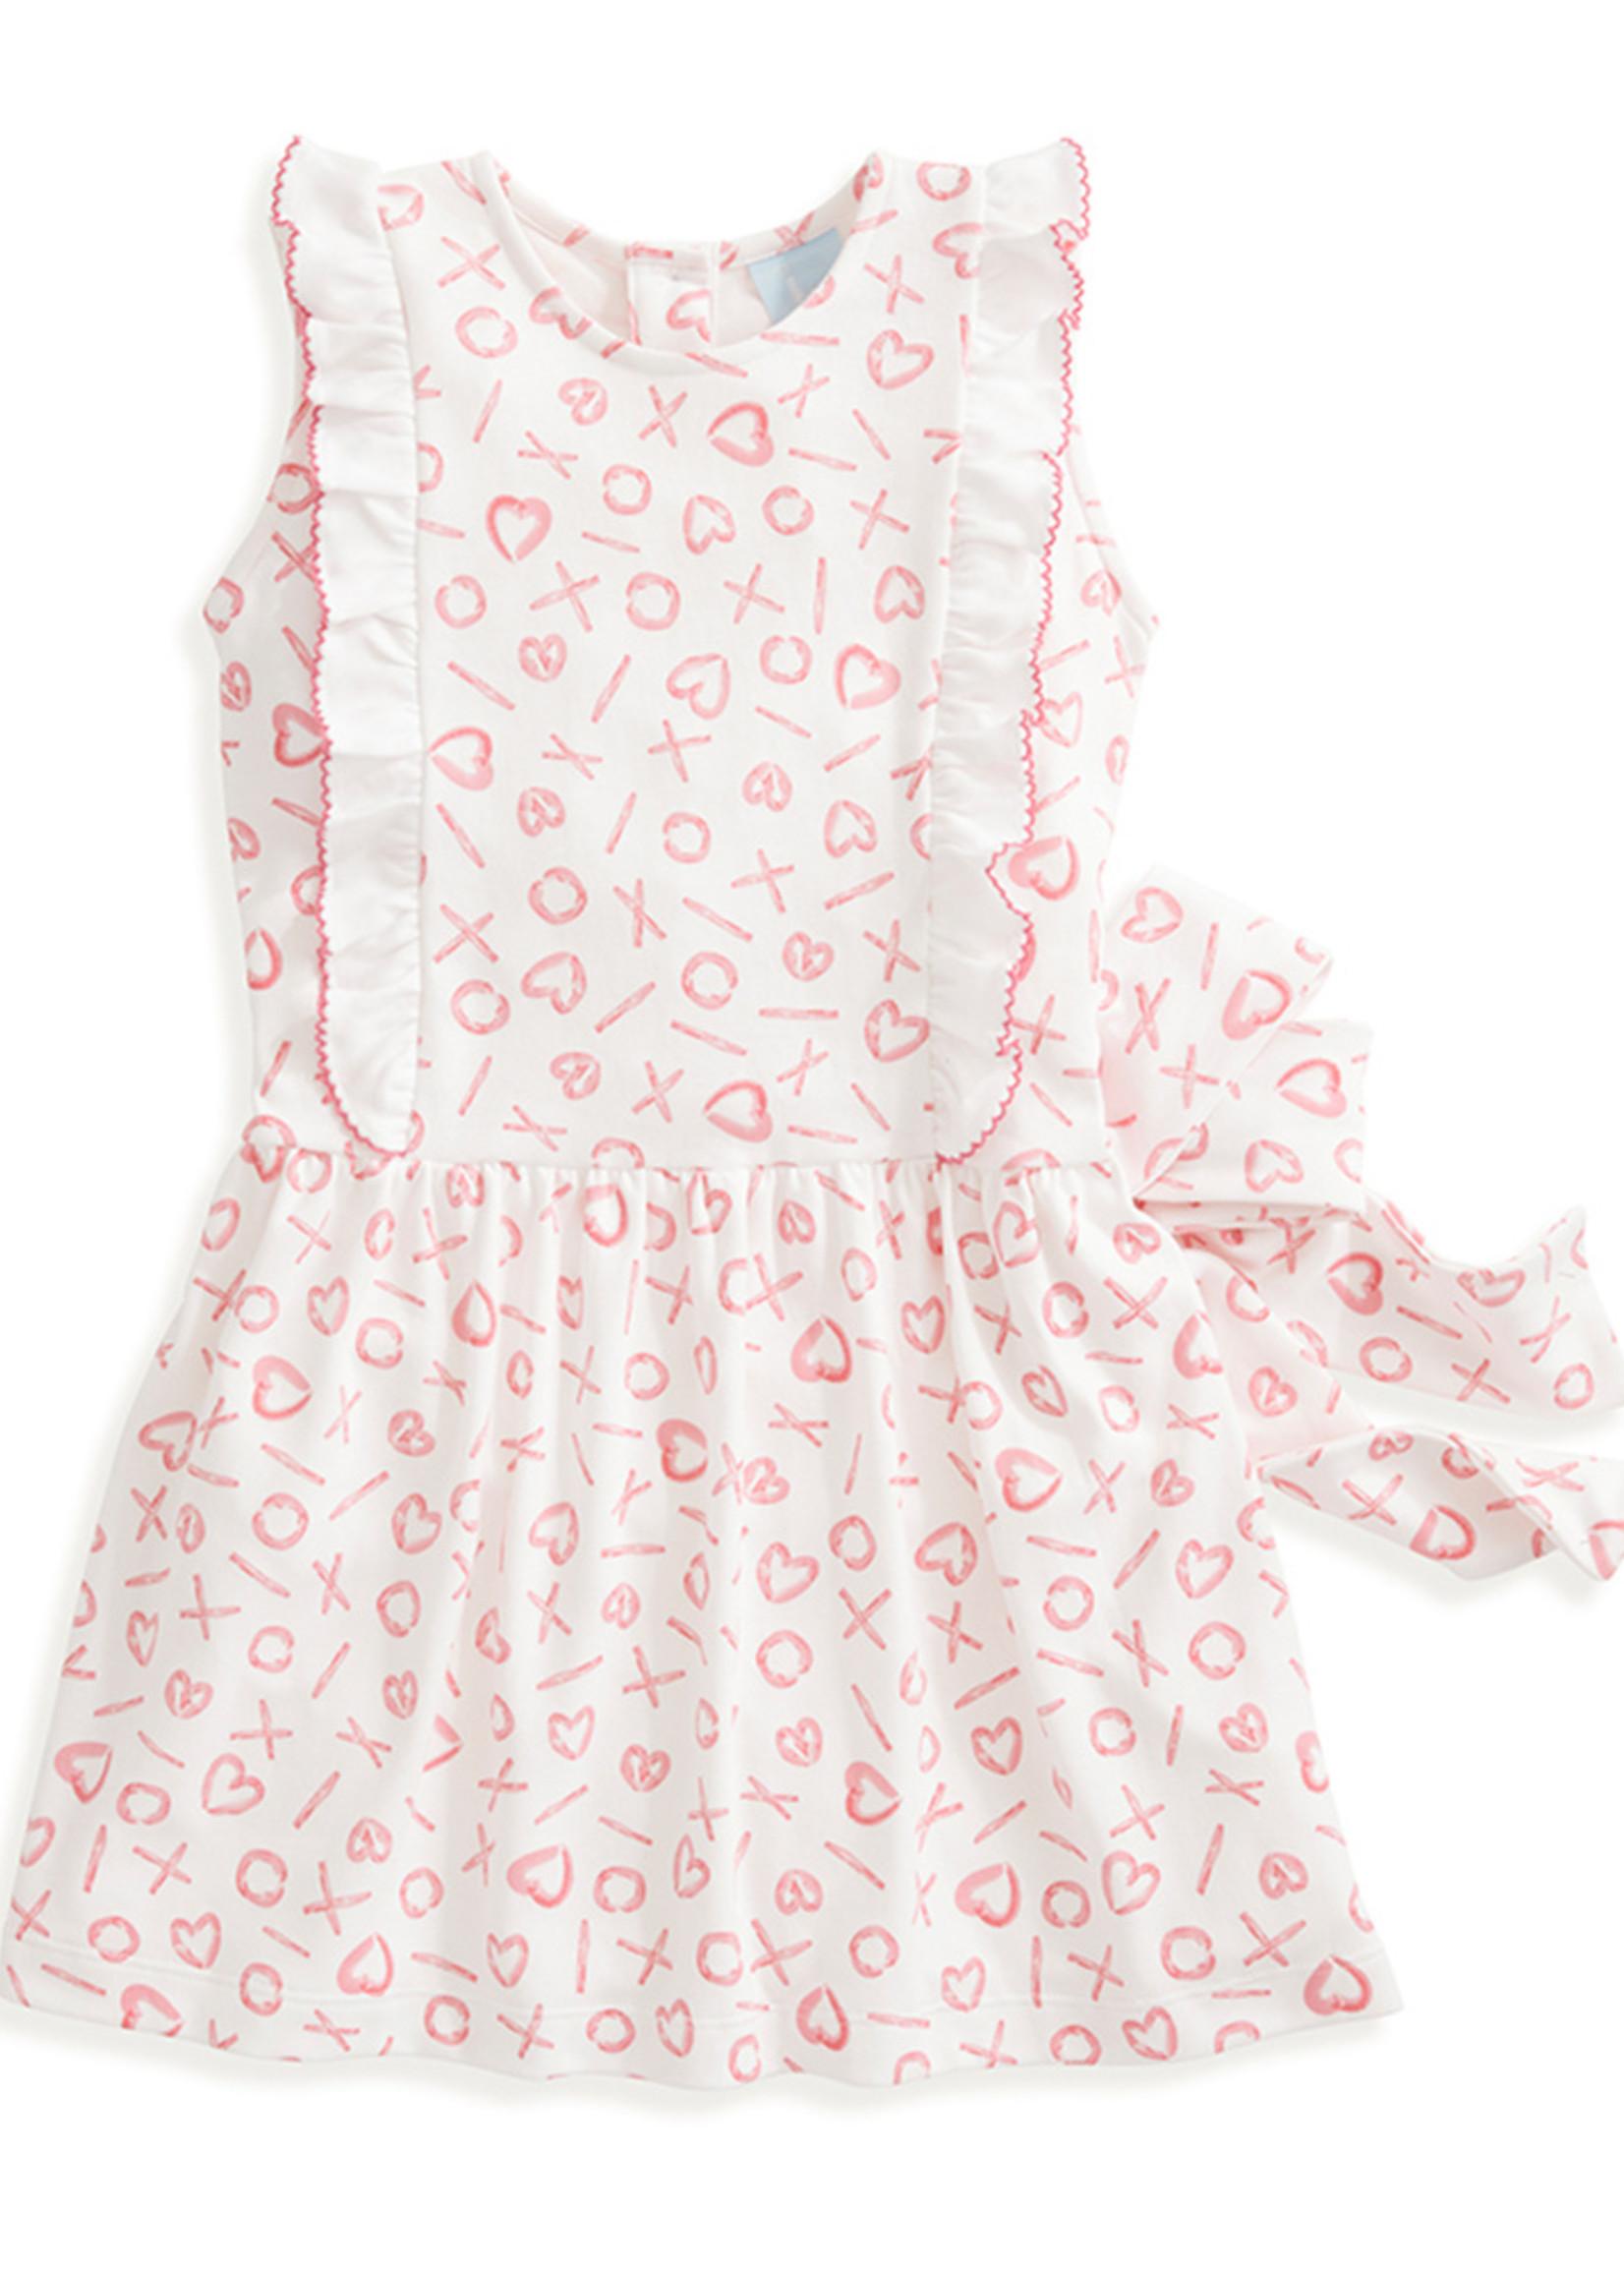 PINK XO SUSSEX DRESS